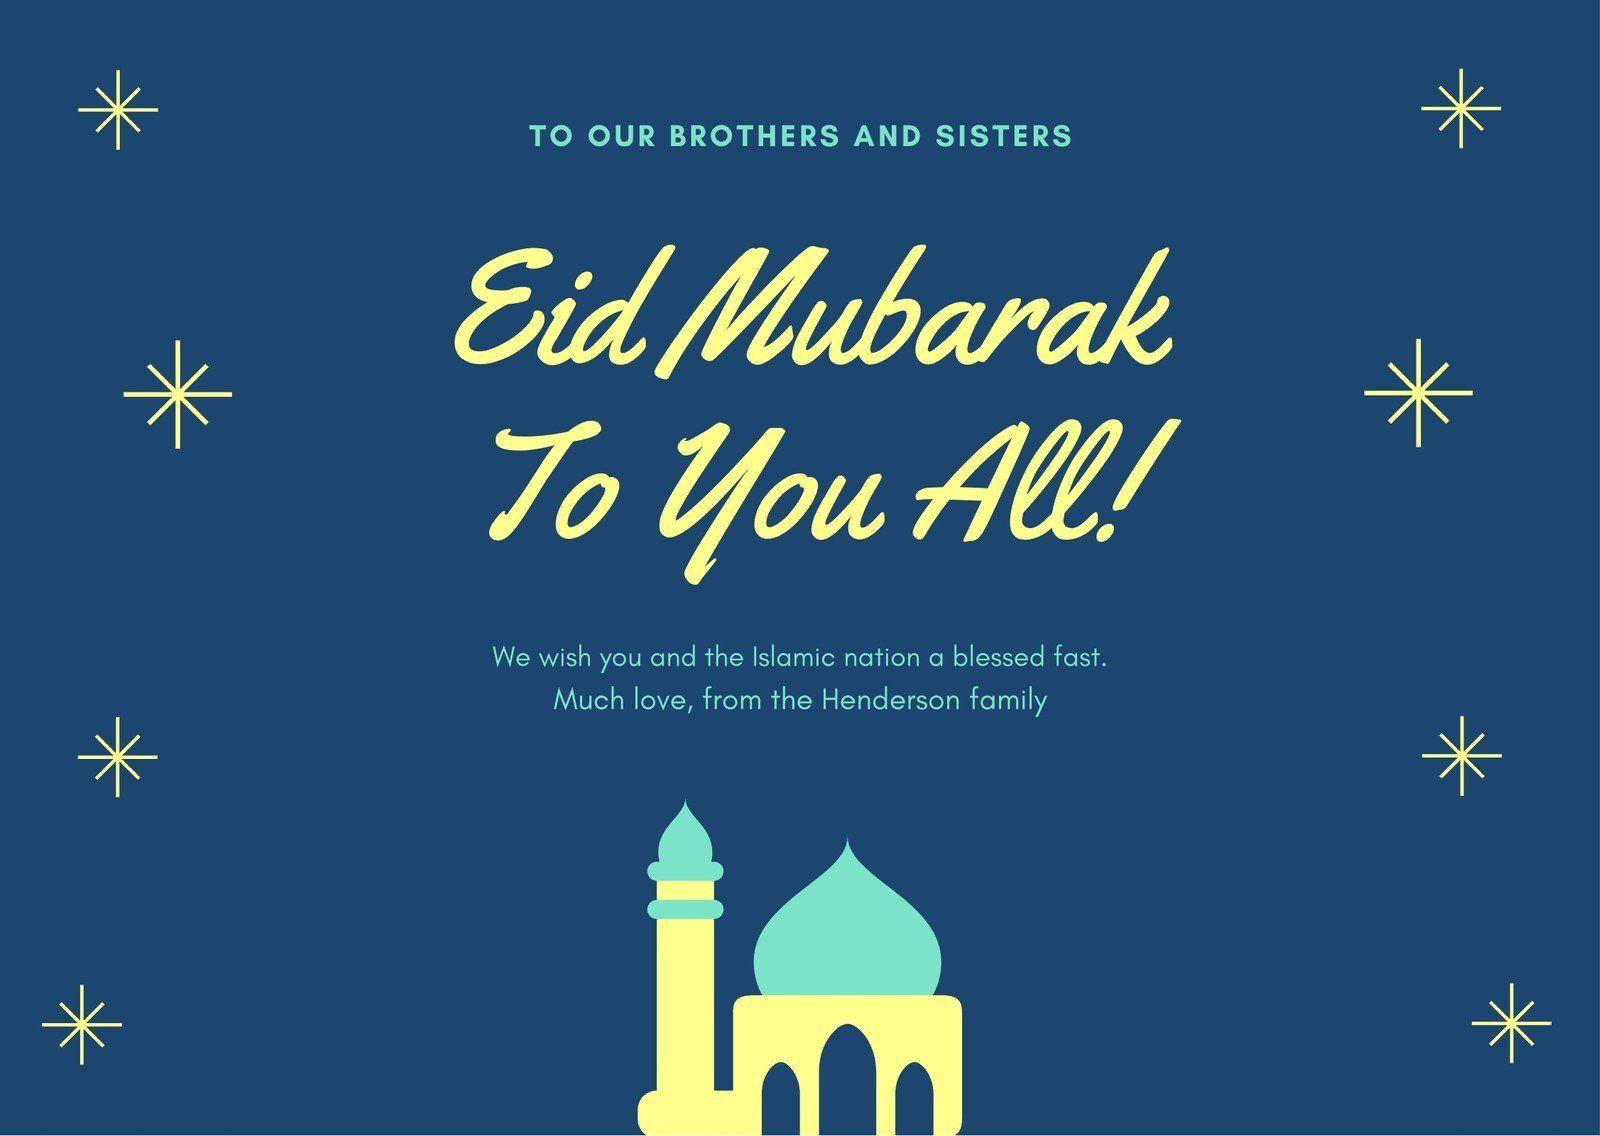 Blue Mosque Illustration Eid Al Fitr Card Templates By Canva Ad Illustration Paid Eid Blue Mosque Happy Eid Mubarak Wishes Eid Mubarak Wishes Eid